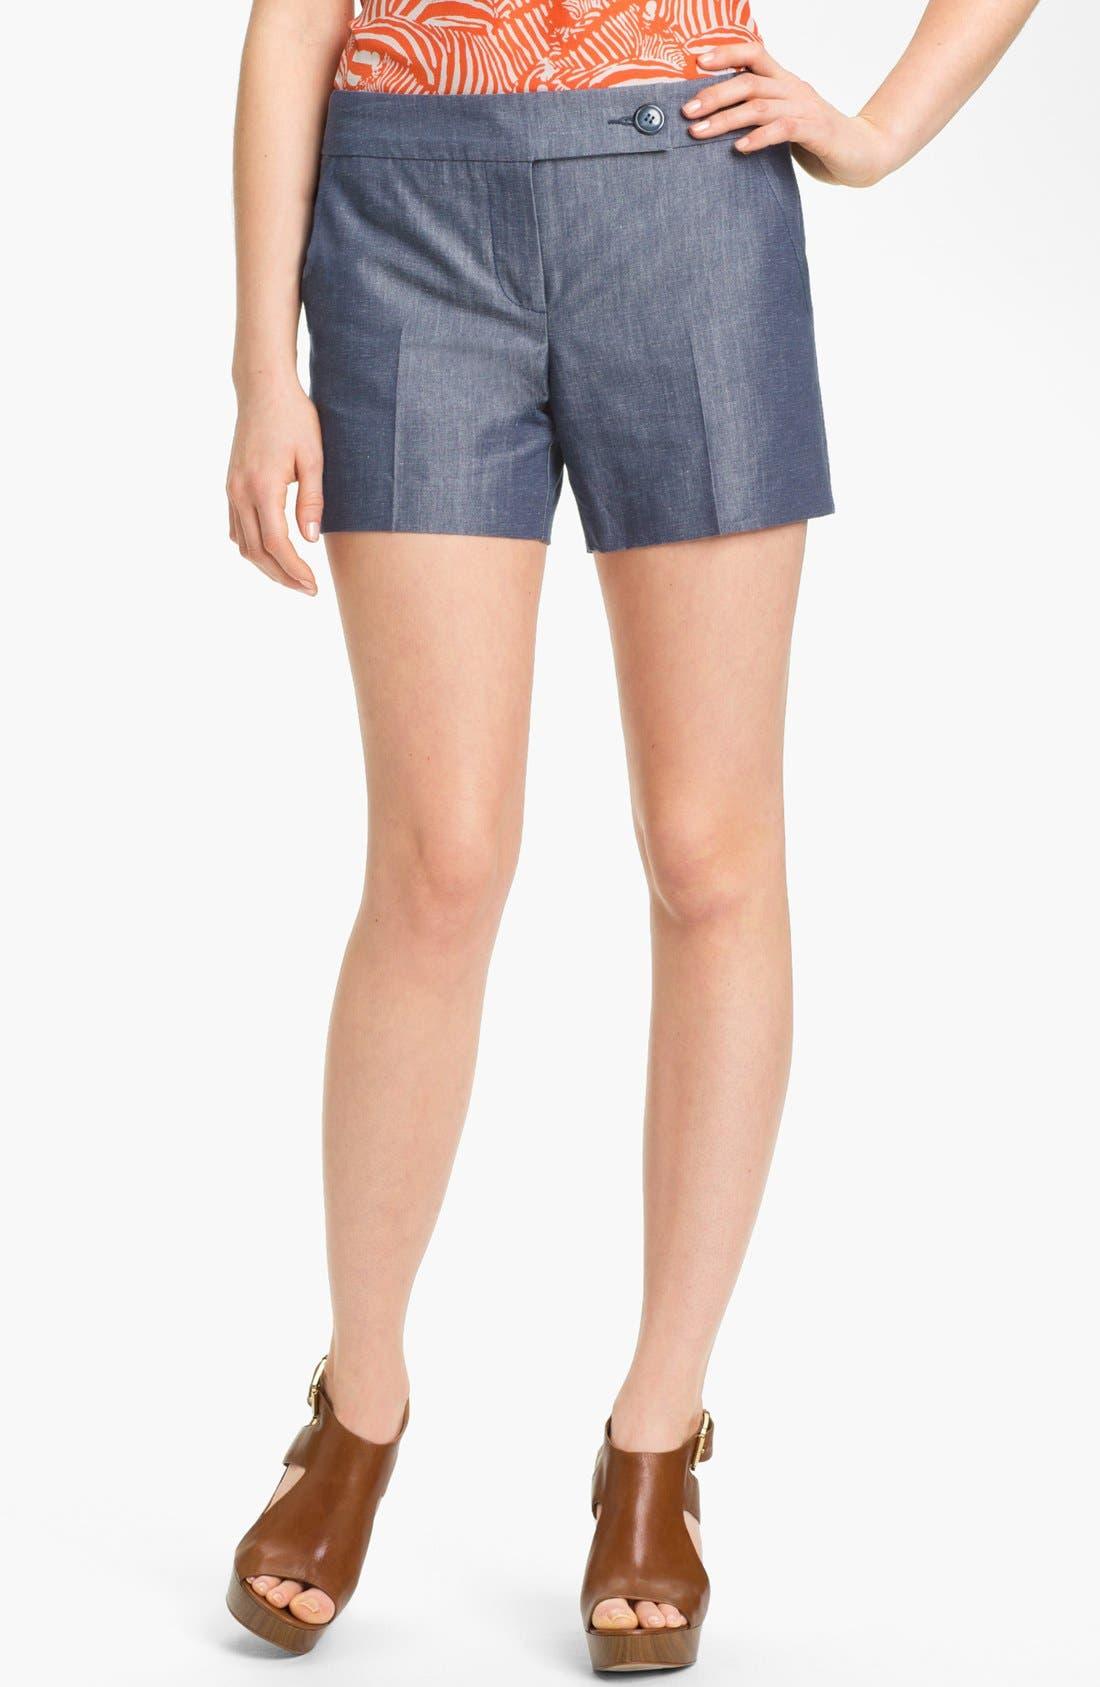 Alternate Image 1 Selected - Trina Turk 'Corbin' Shorts